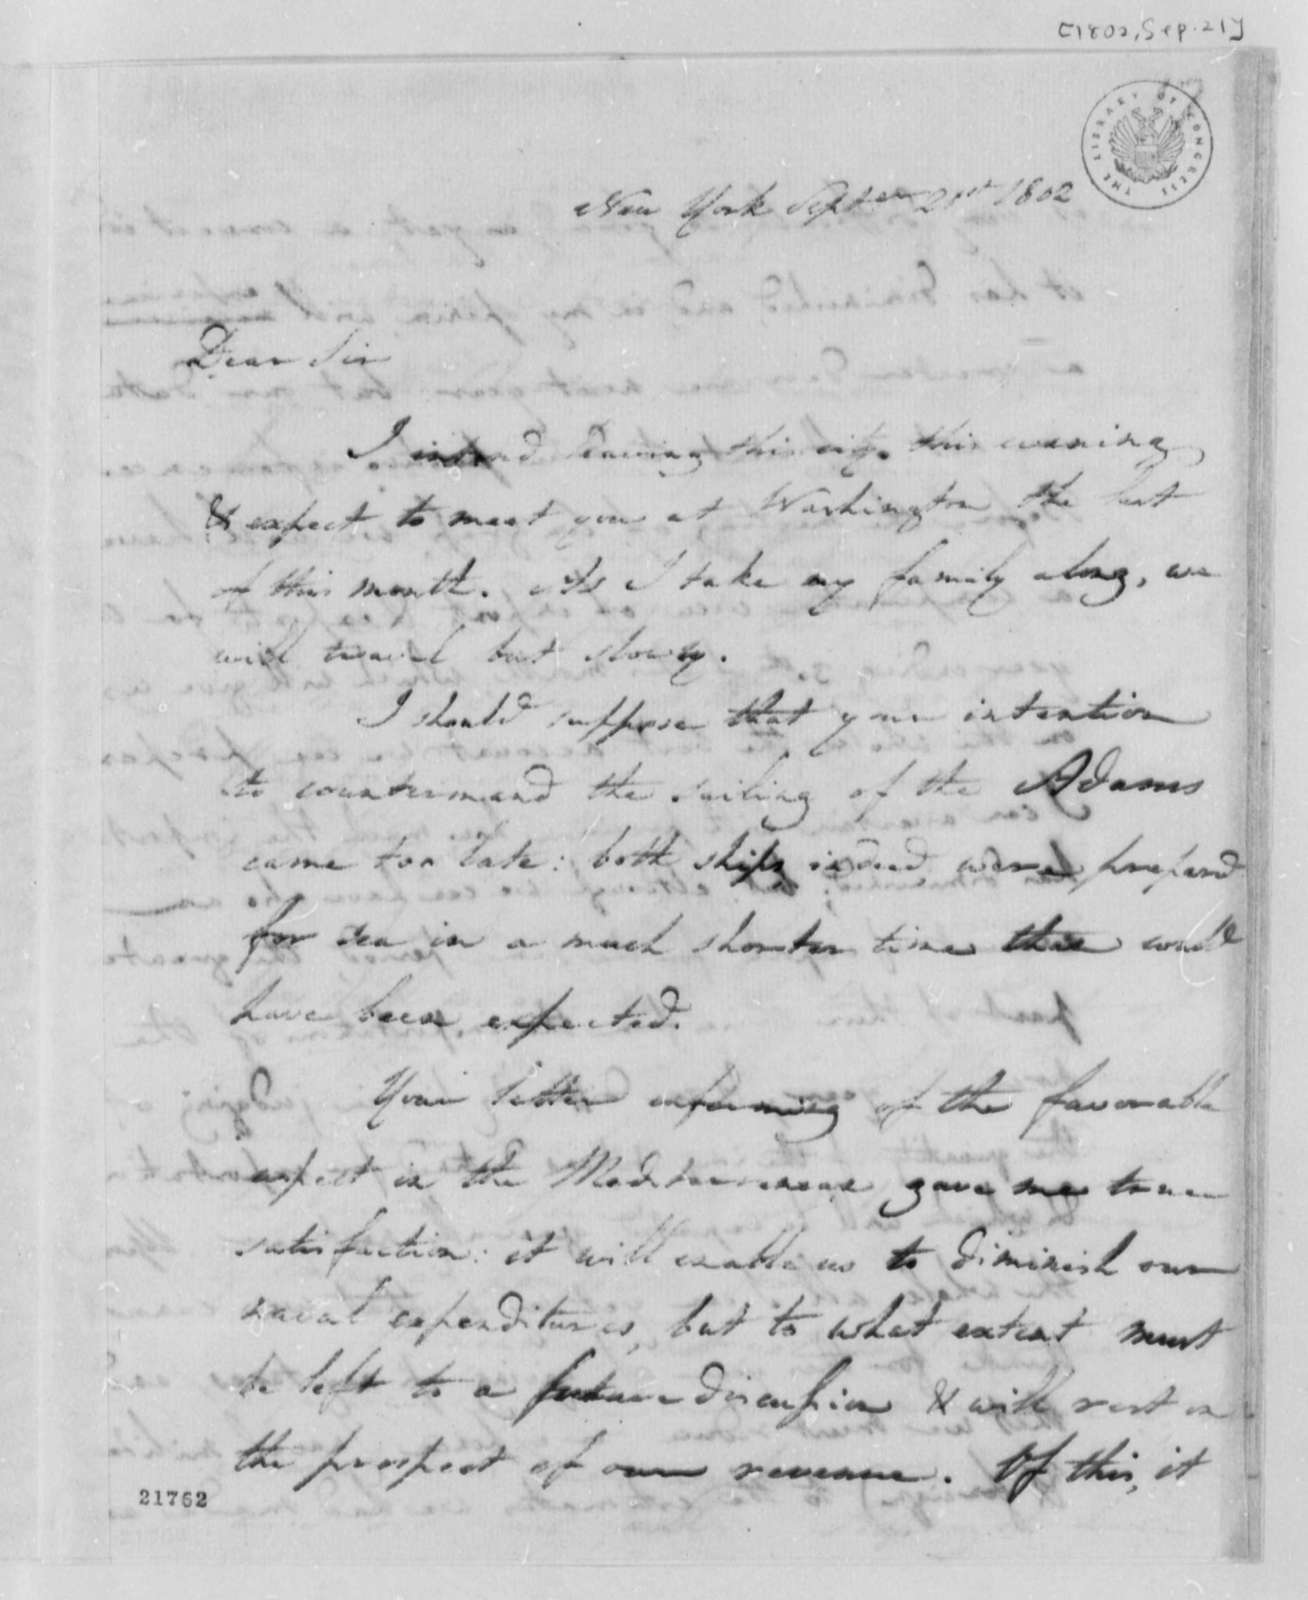 Albert Gallatin to Thomas Jefferson, September 21, 1802